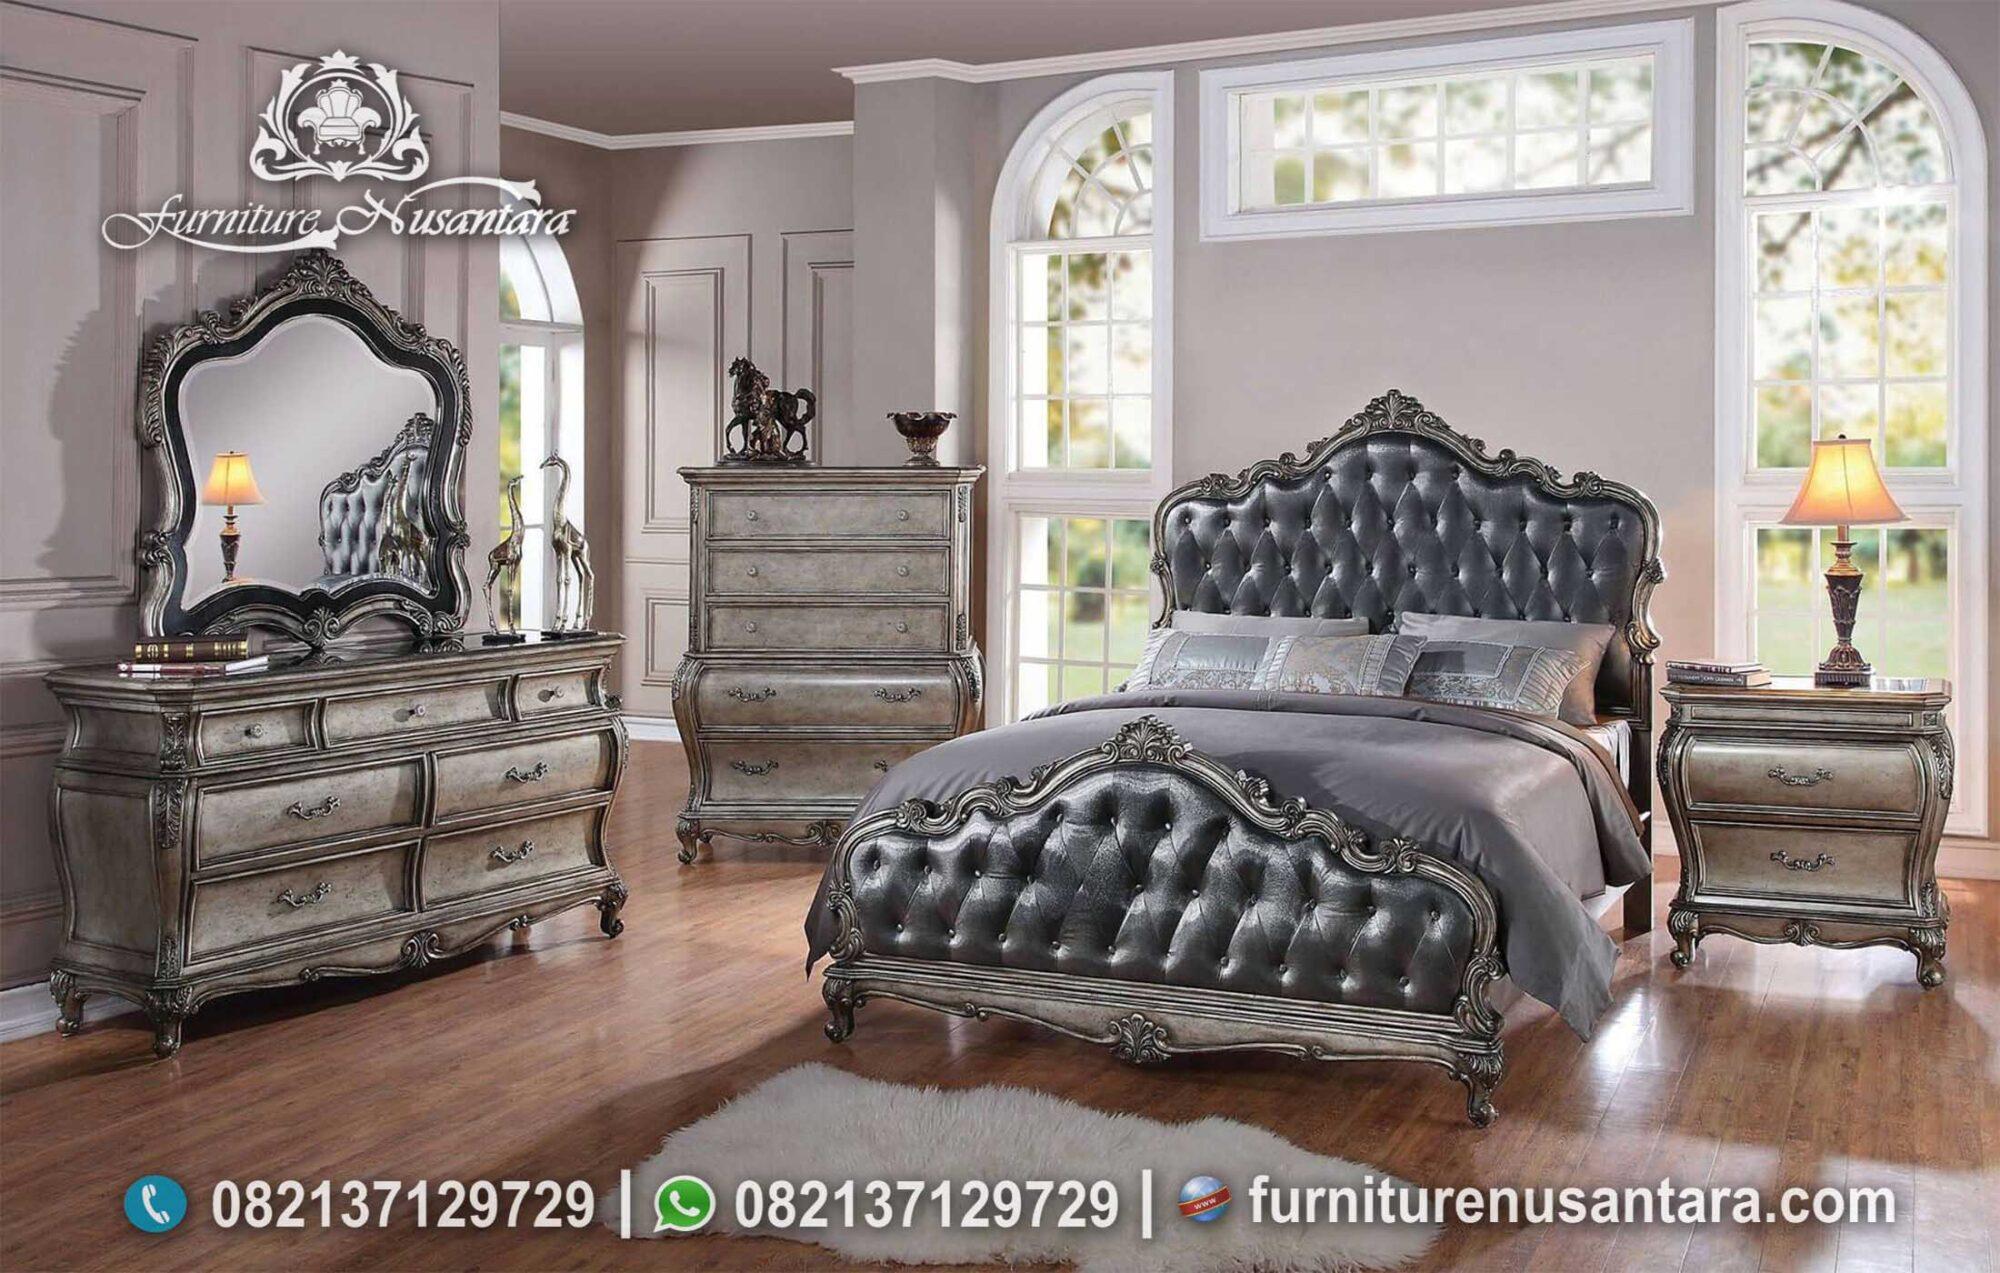 Inspirasi Kamar Set Warna Abu Abu Mewah KS-215, Furniture Nusantara